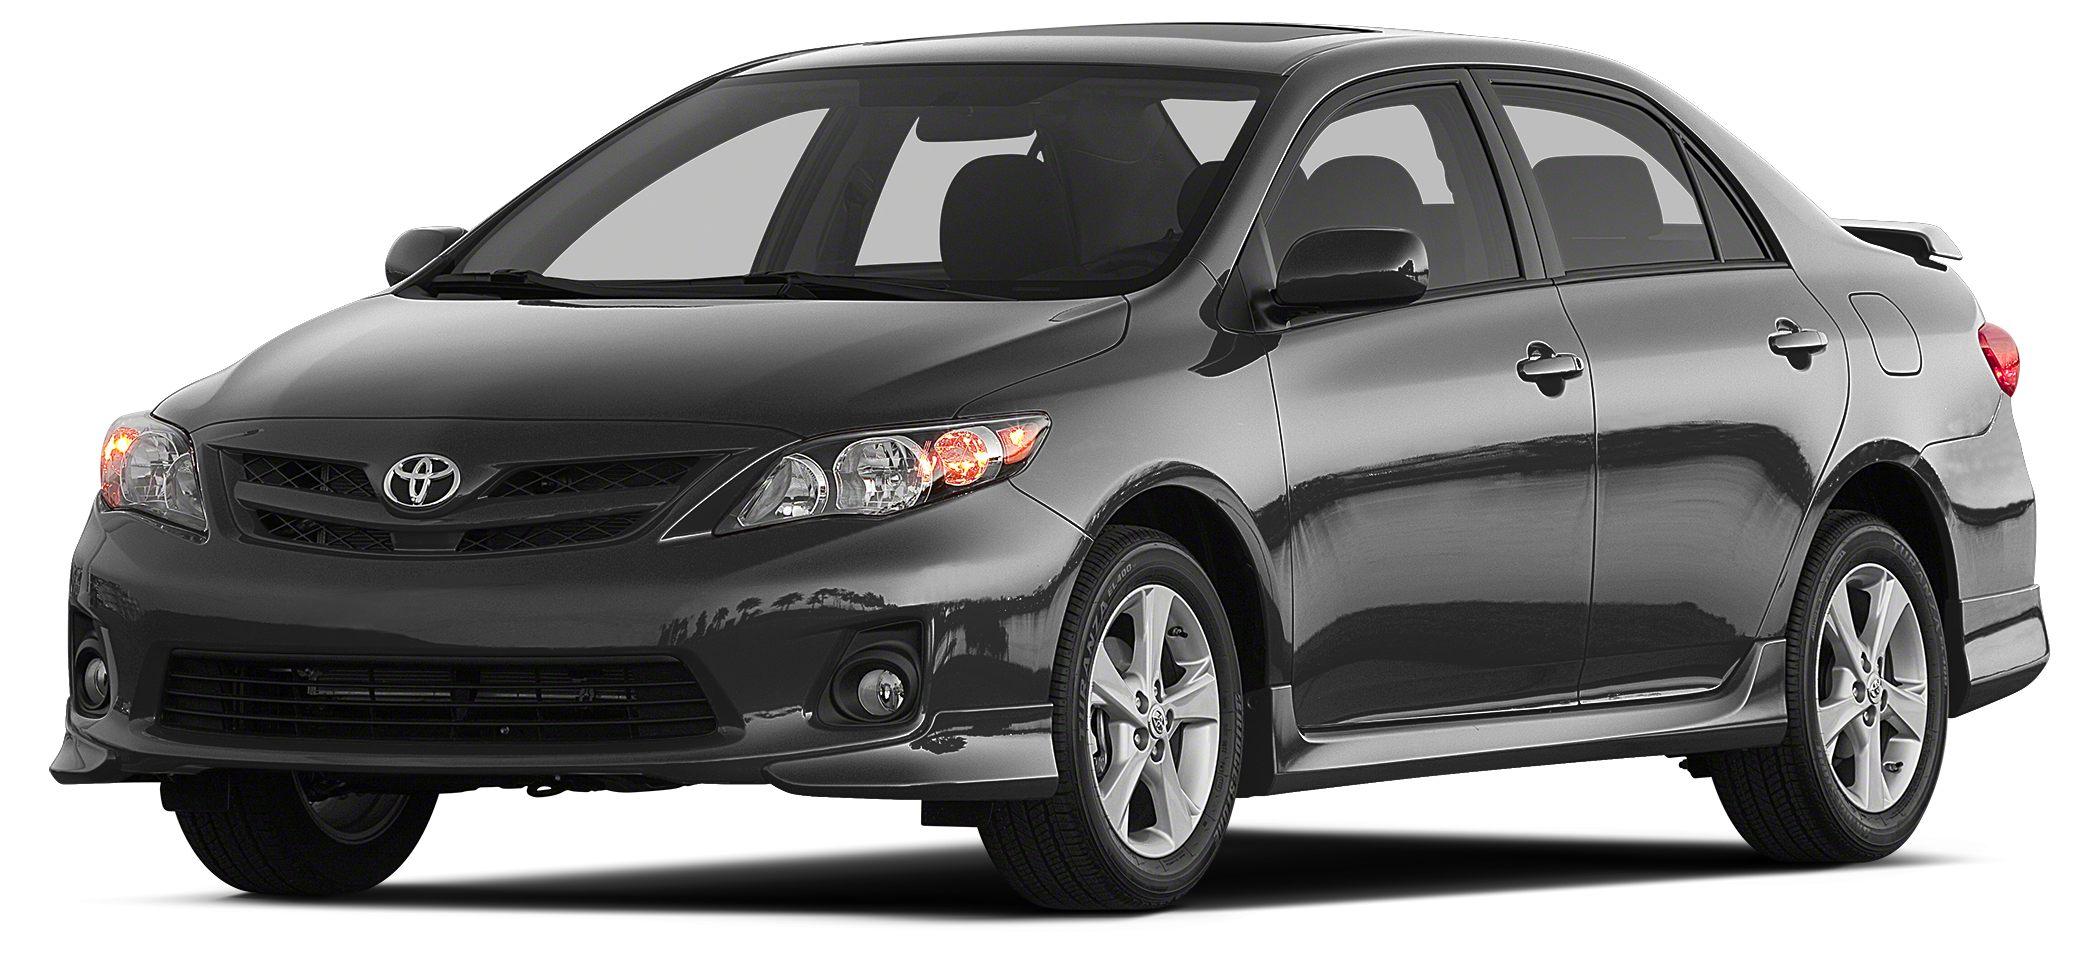 2011 Toyota Corolla S Miles 97518Color Magnetic Gray Metallic Stock 7170222B VIN 2T1BU4EE5BC